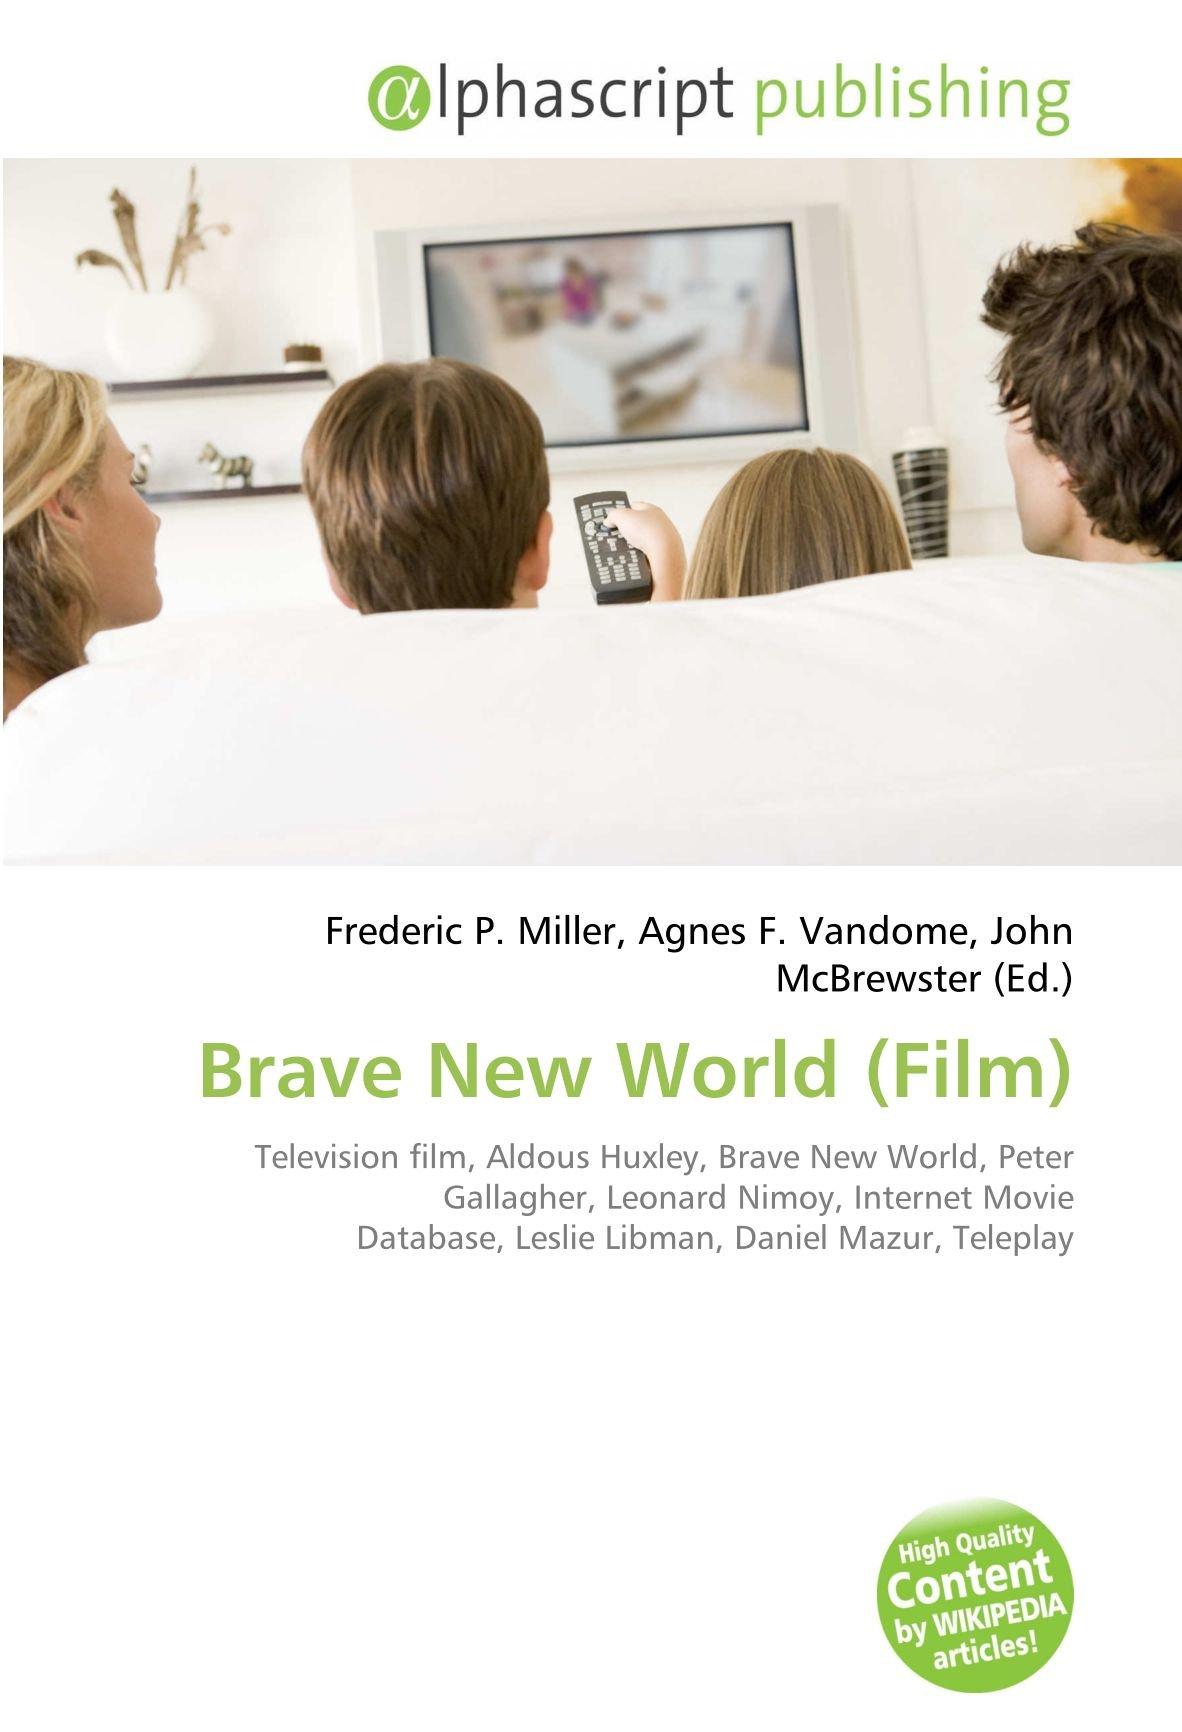 Brave New World Film : Television film, Aldous Huxley, Brave New World, Peter Gallagher, Leonard Nimoy, Internet Movie Database, Leslie Libman, Daniel Mazur ...